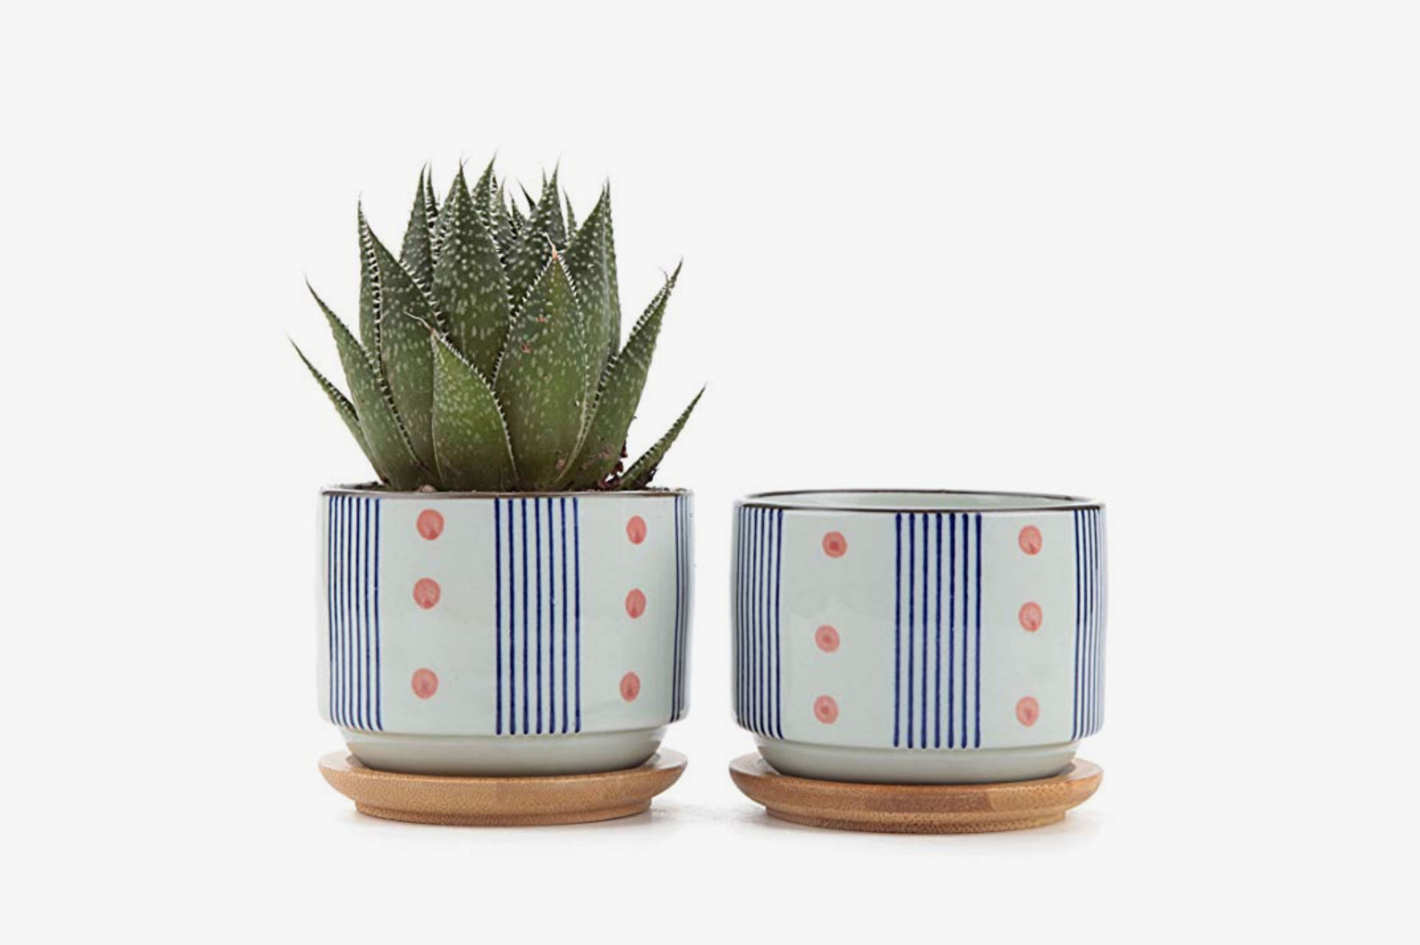 3 Inch Ceramic Japanese Style Cactus Pot